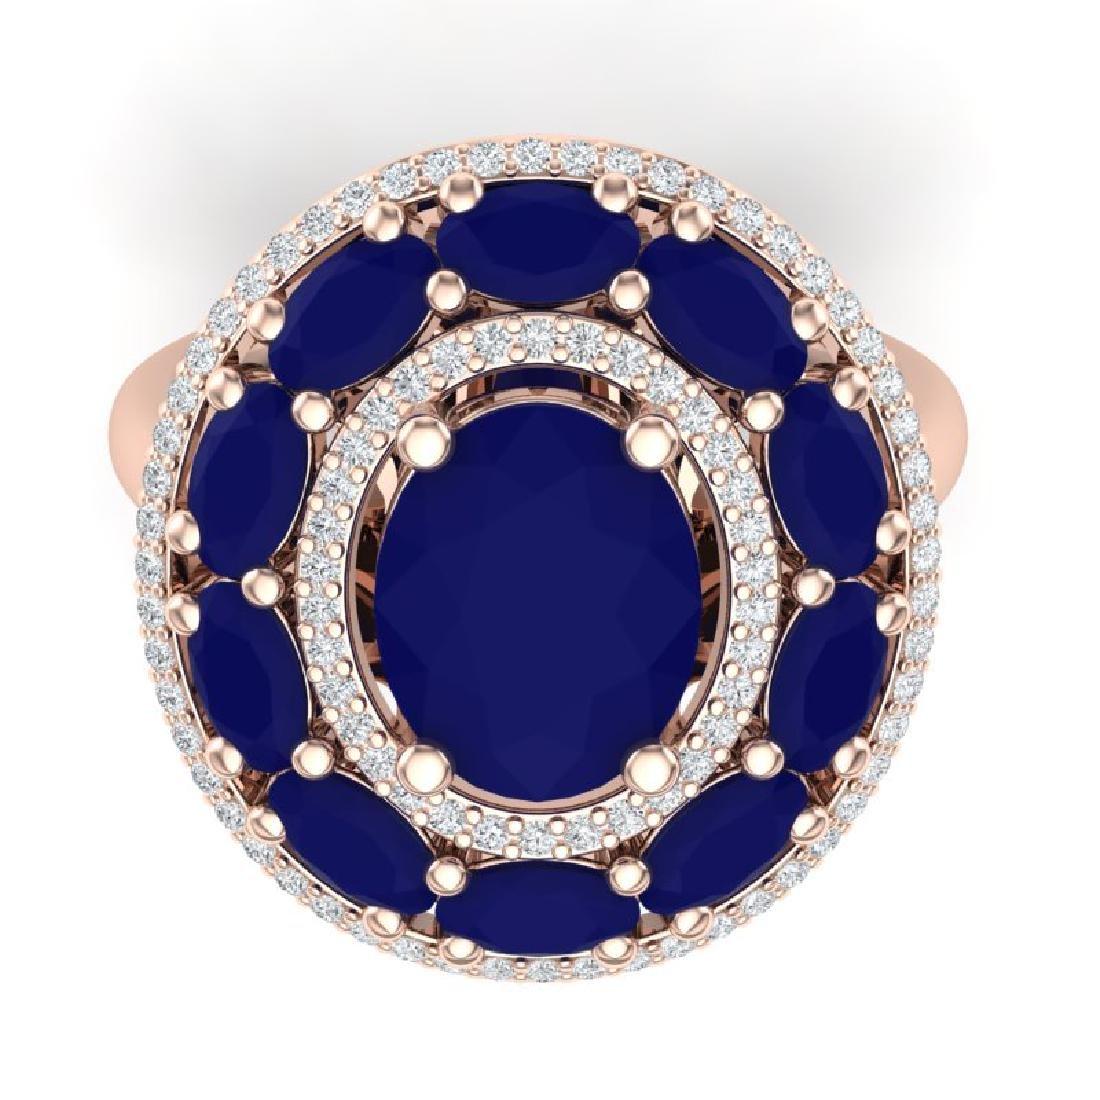 8.05 CTW Royalty Designer Sapphire & VS Diamond Ring - 2